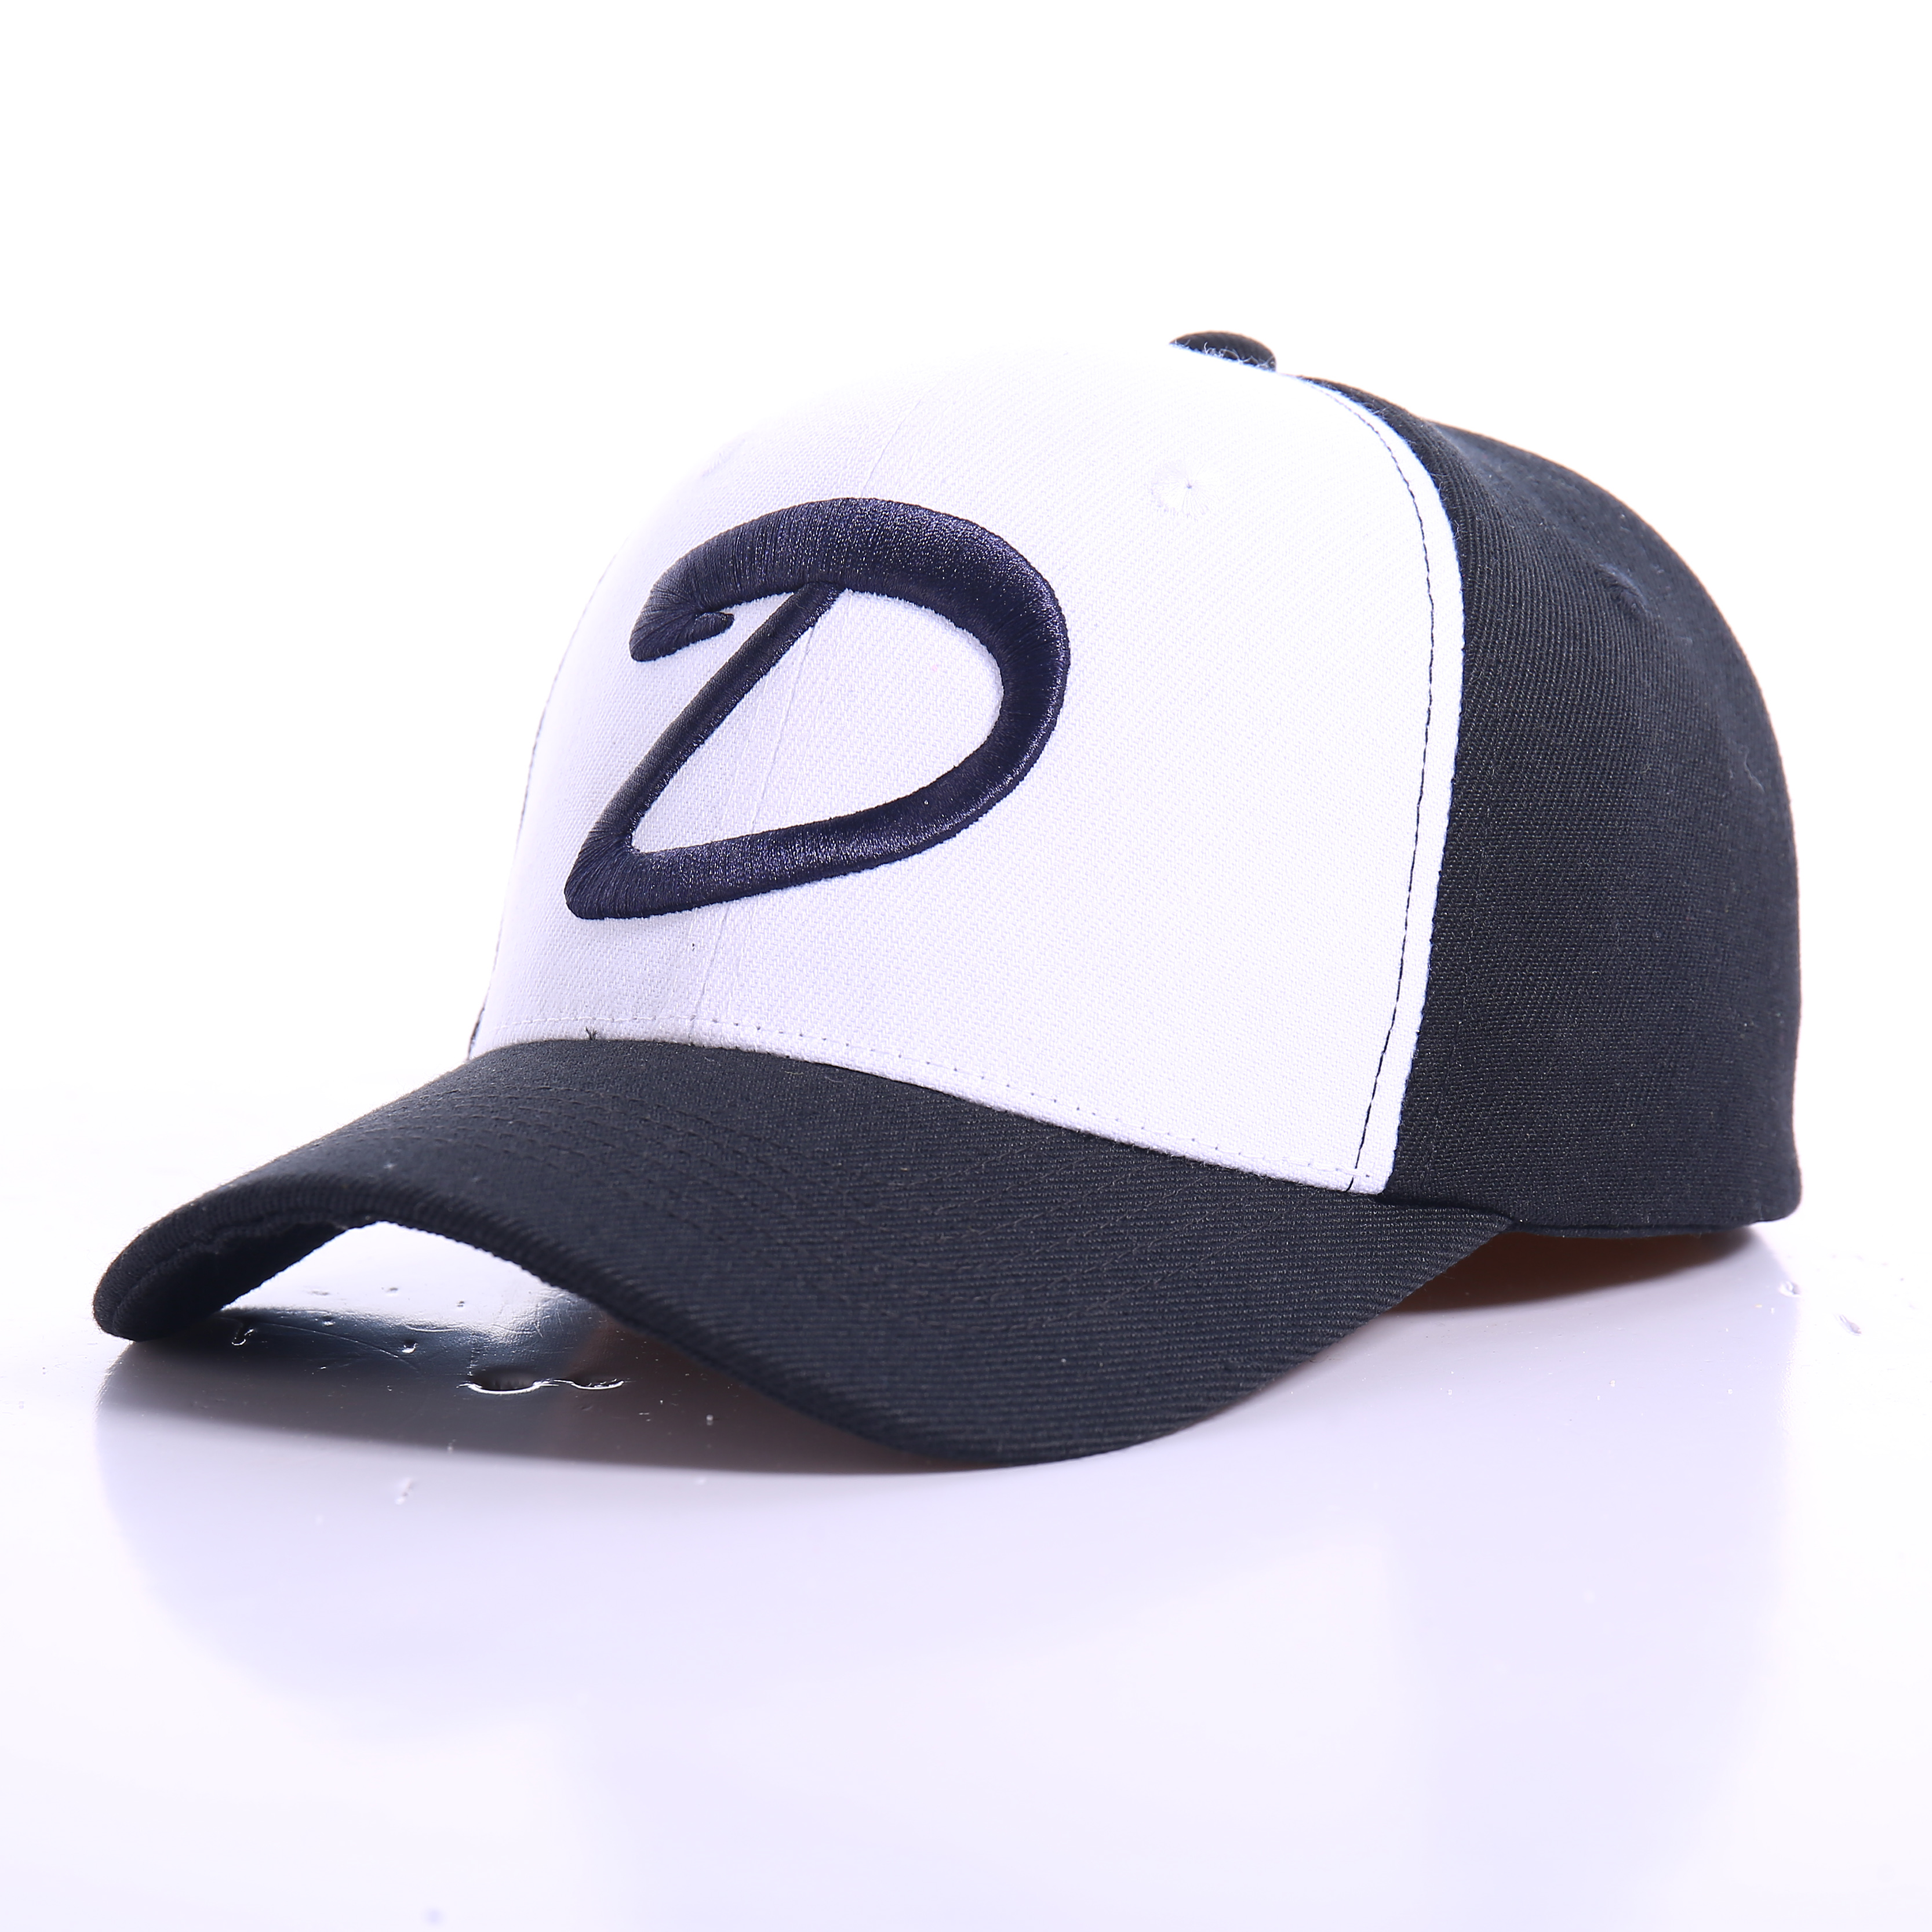 Clay baseball cap female trendy Man Street versatile trendy man hat chic spring and summer black letter sunshade cap